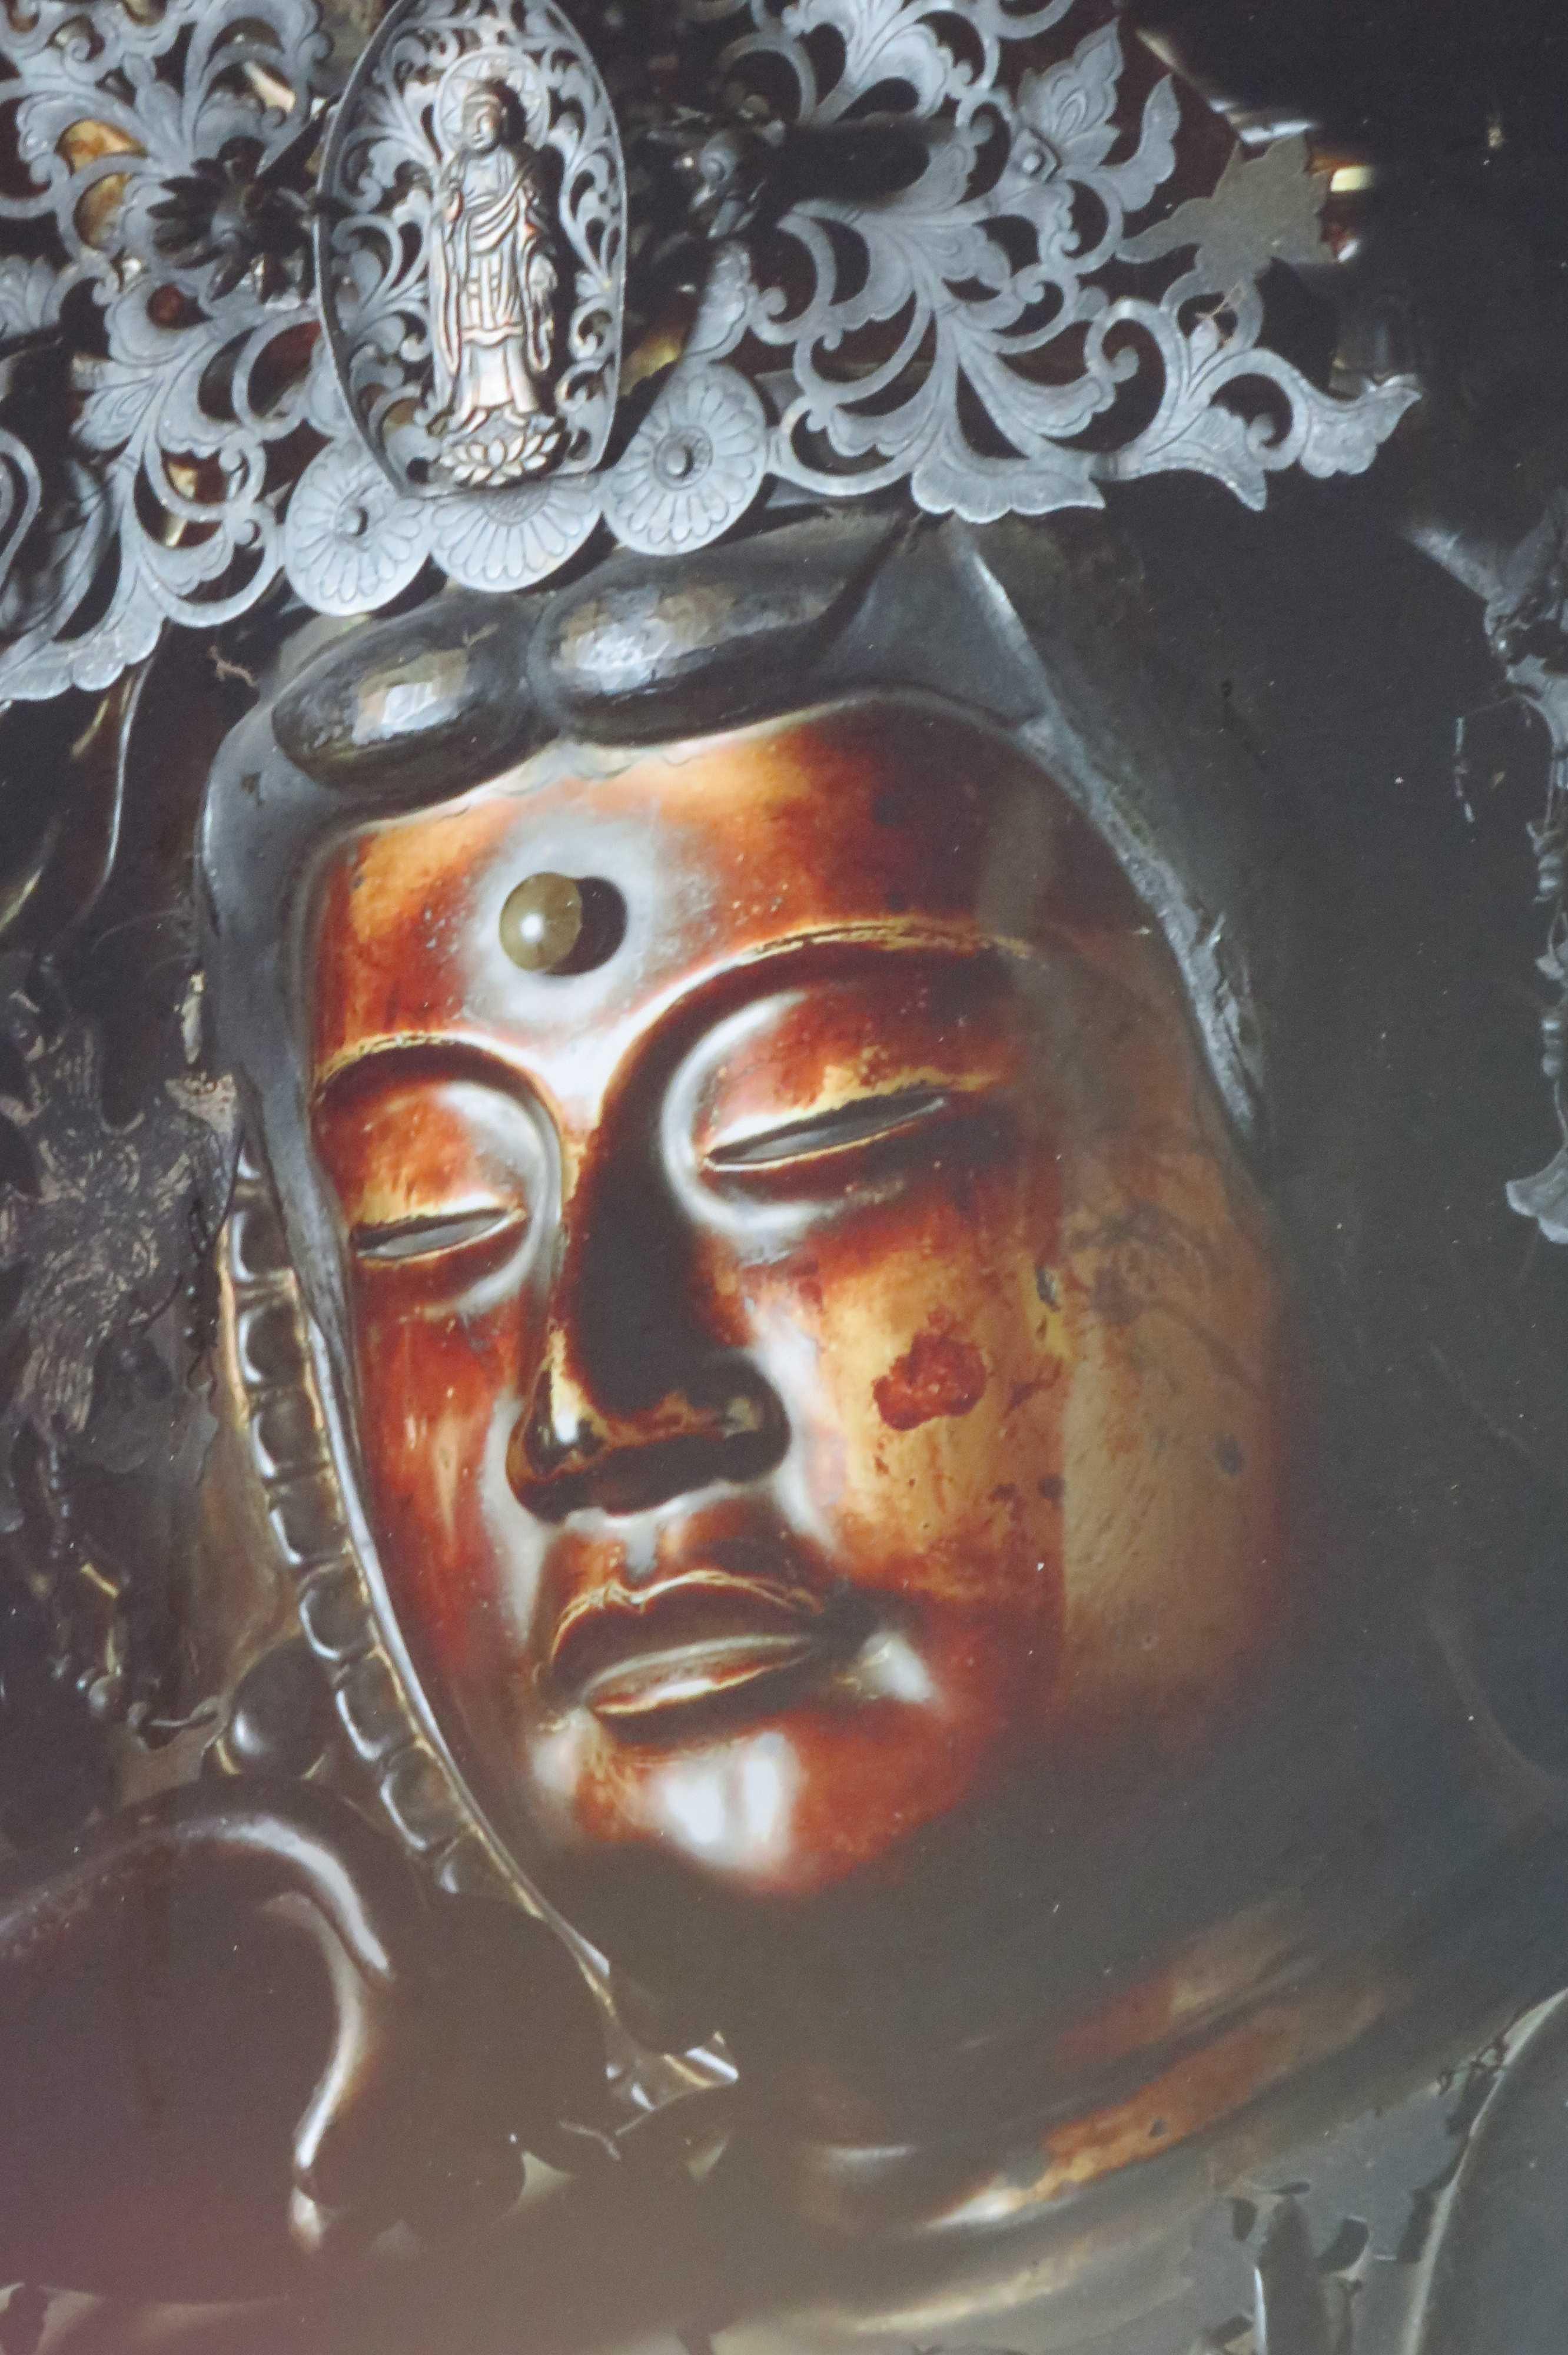 京都・六角堂の前立本尊 如意輪観世音菩薩のご尊顔